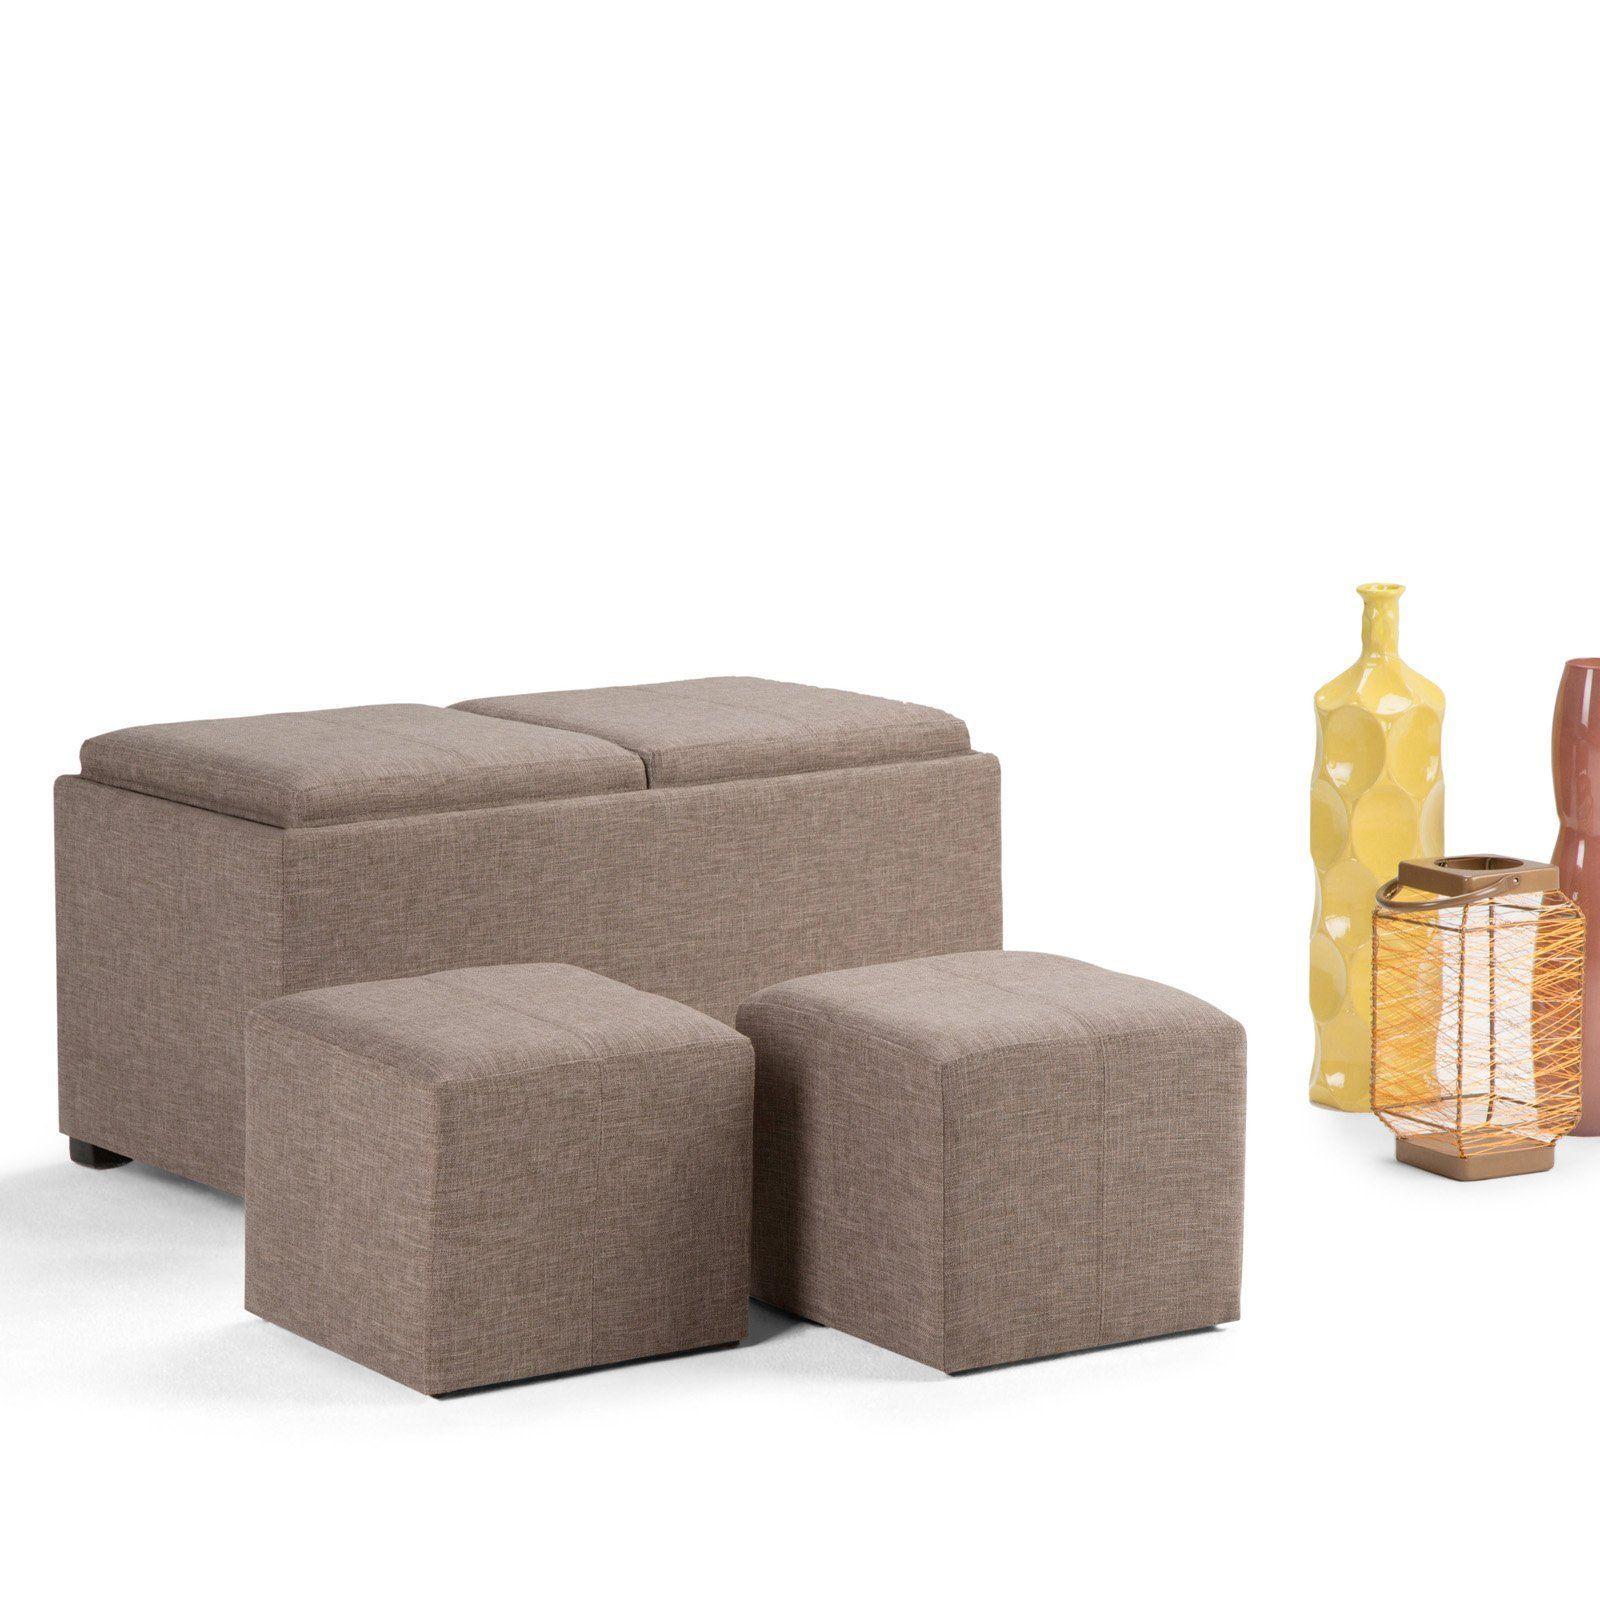 Simpli Home Avalon 5 Piece Storage Bench And Ottoman Set Fawn